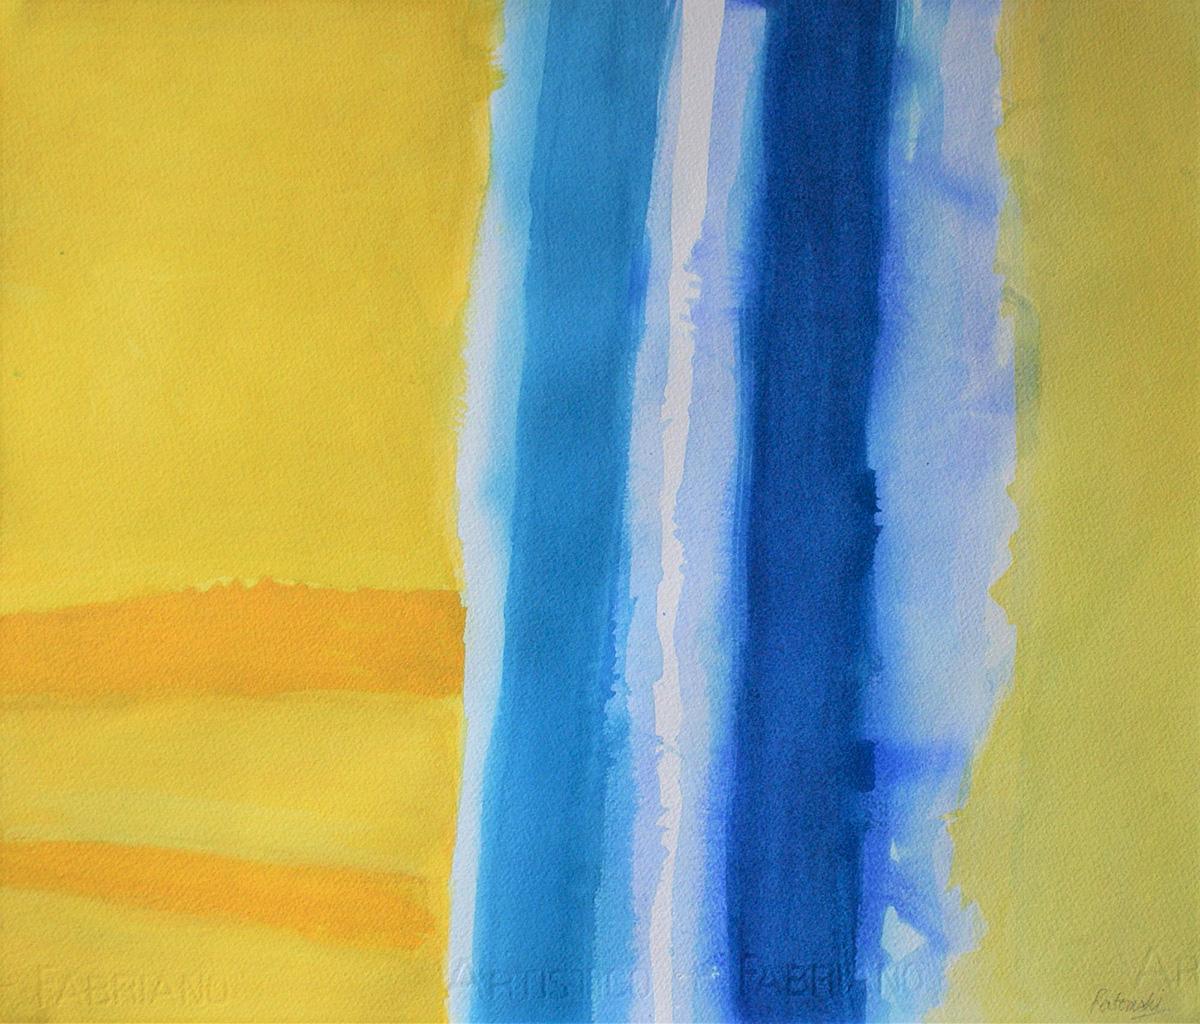 Stephen Ratomski, 'Venice Moment', watercolour